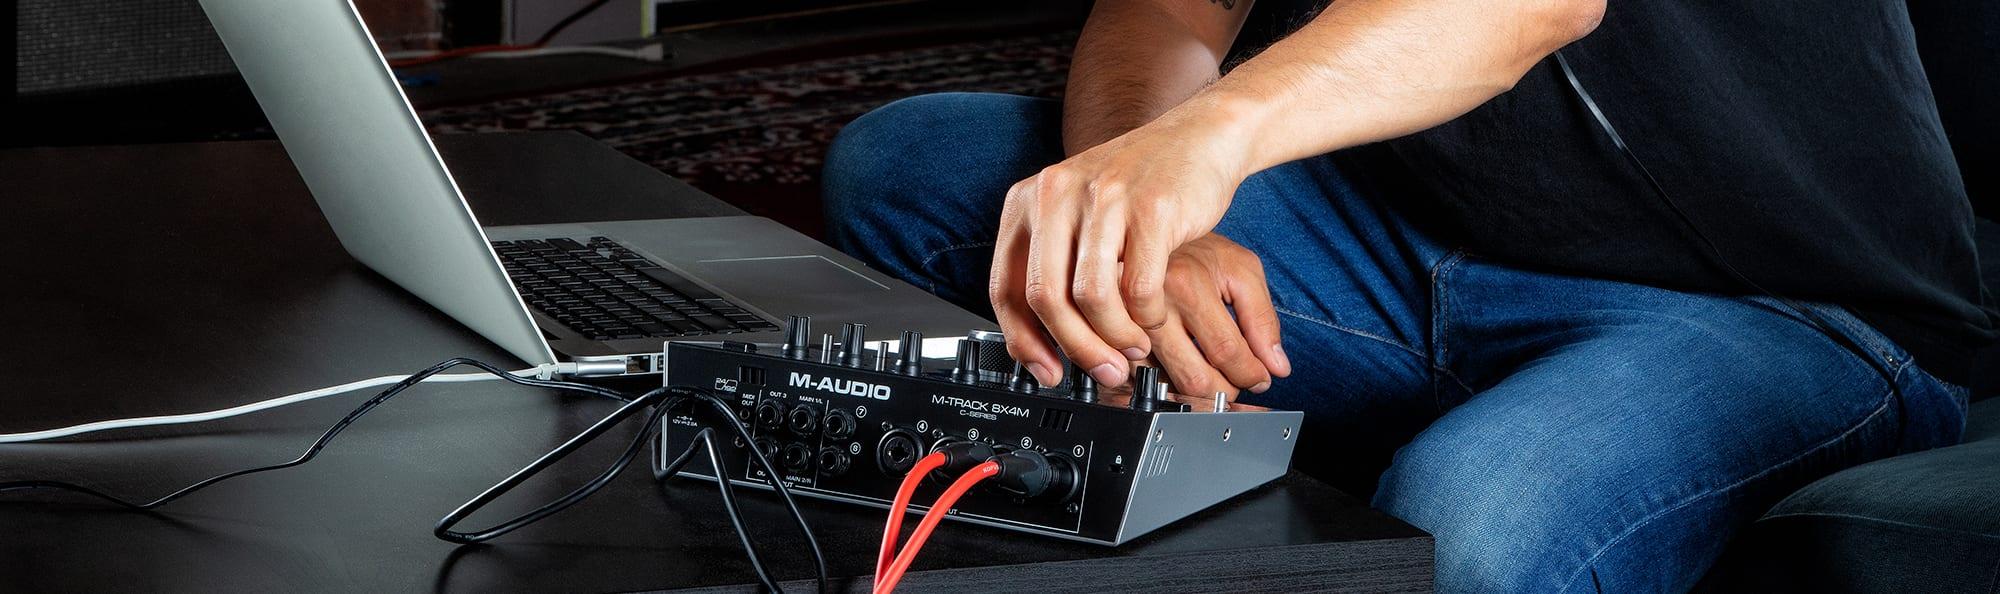 M-Audio 8X4M - back